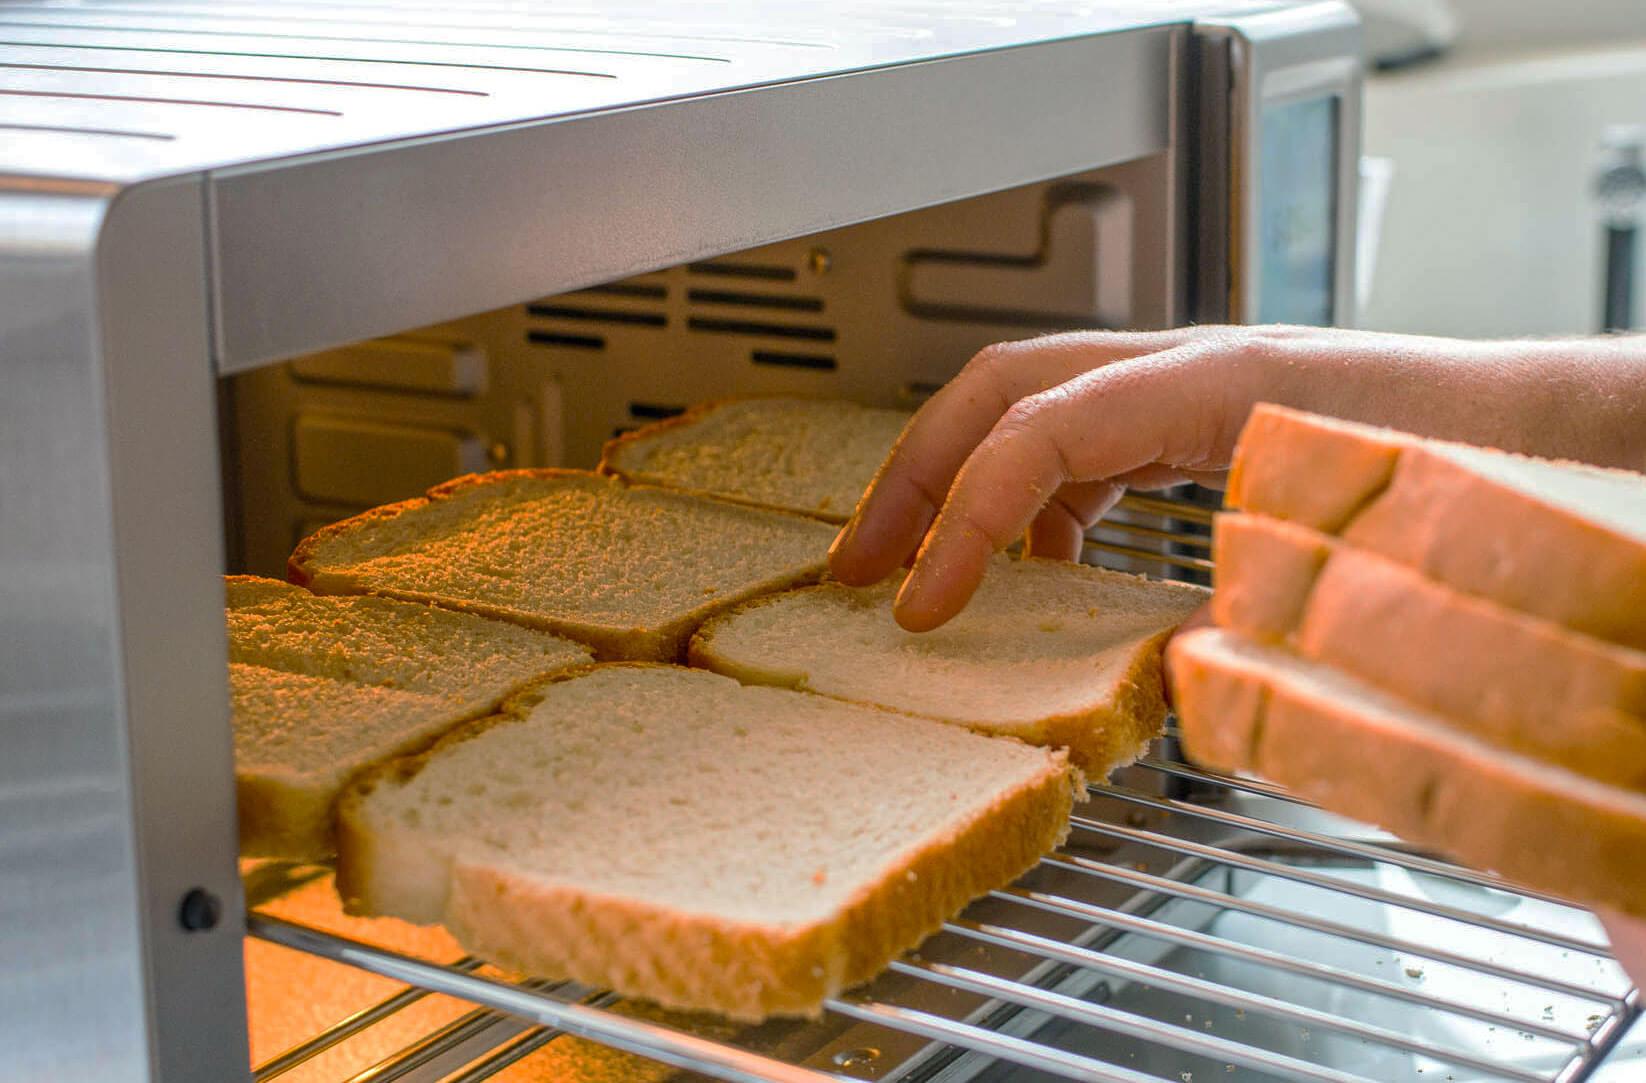 Cuisinart TOB-260N1 toaster oven